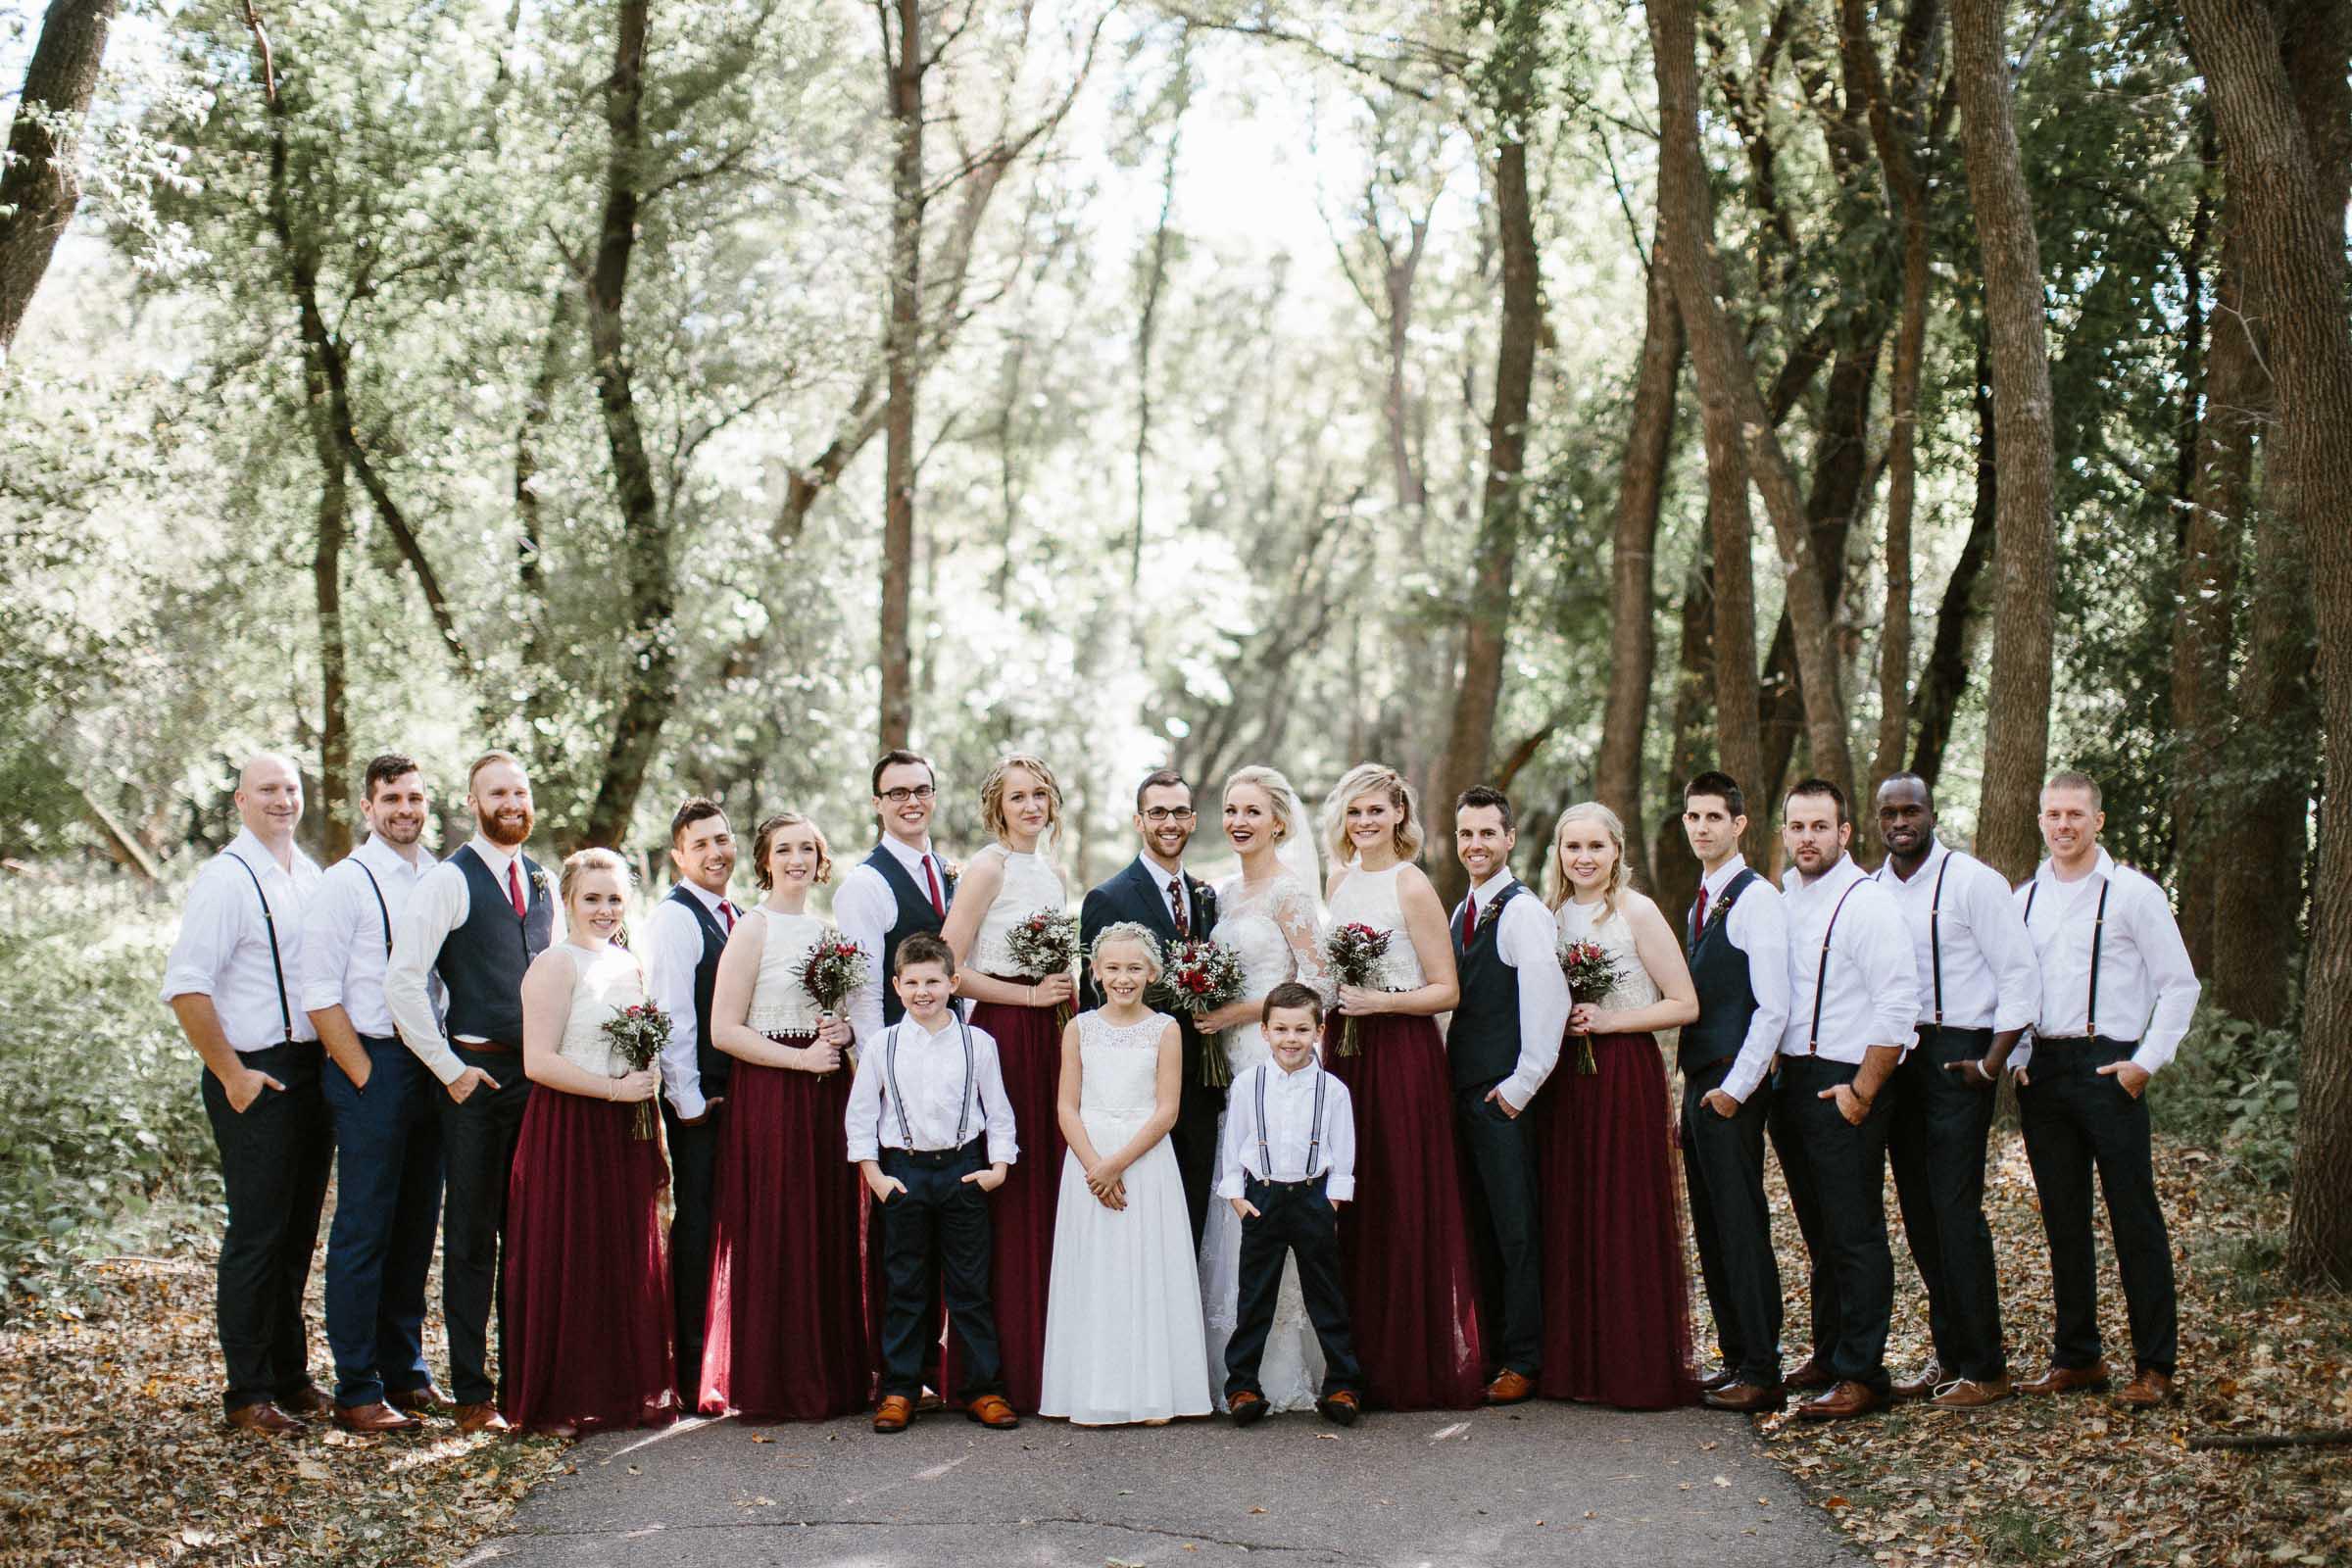 Jenna&Austin_SiouxFalls_Wedding_Photographer_067.jpg